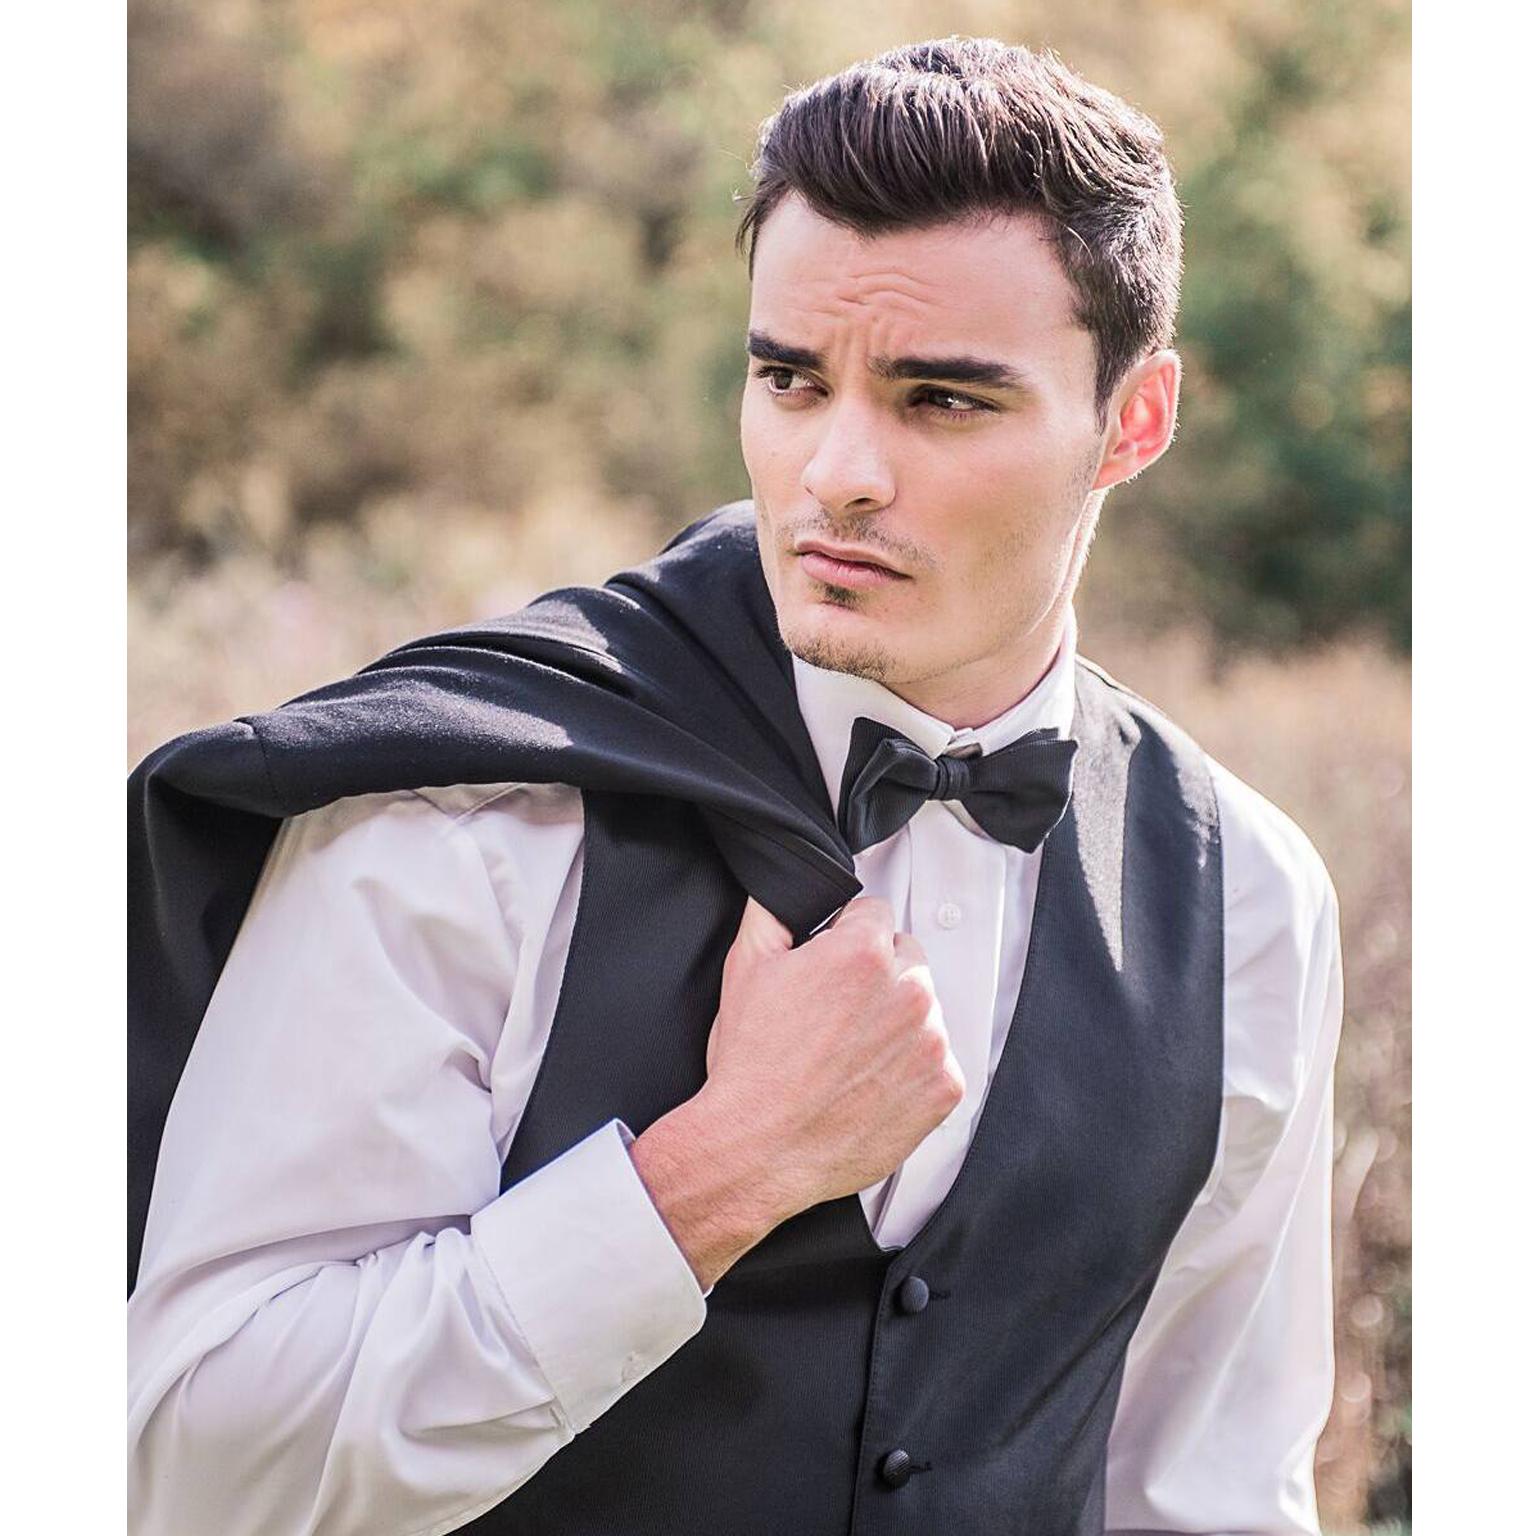 Toronto-Fitness-Model-Agency-Bridal-Groom-Lifestyle-Portrait-Lucas-Bertolino